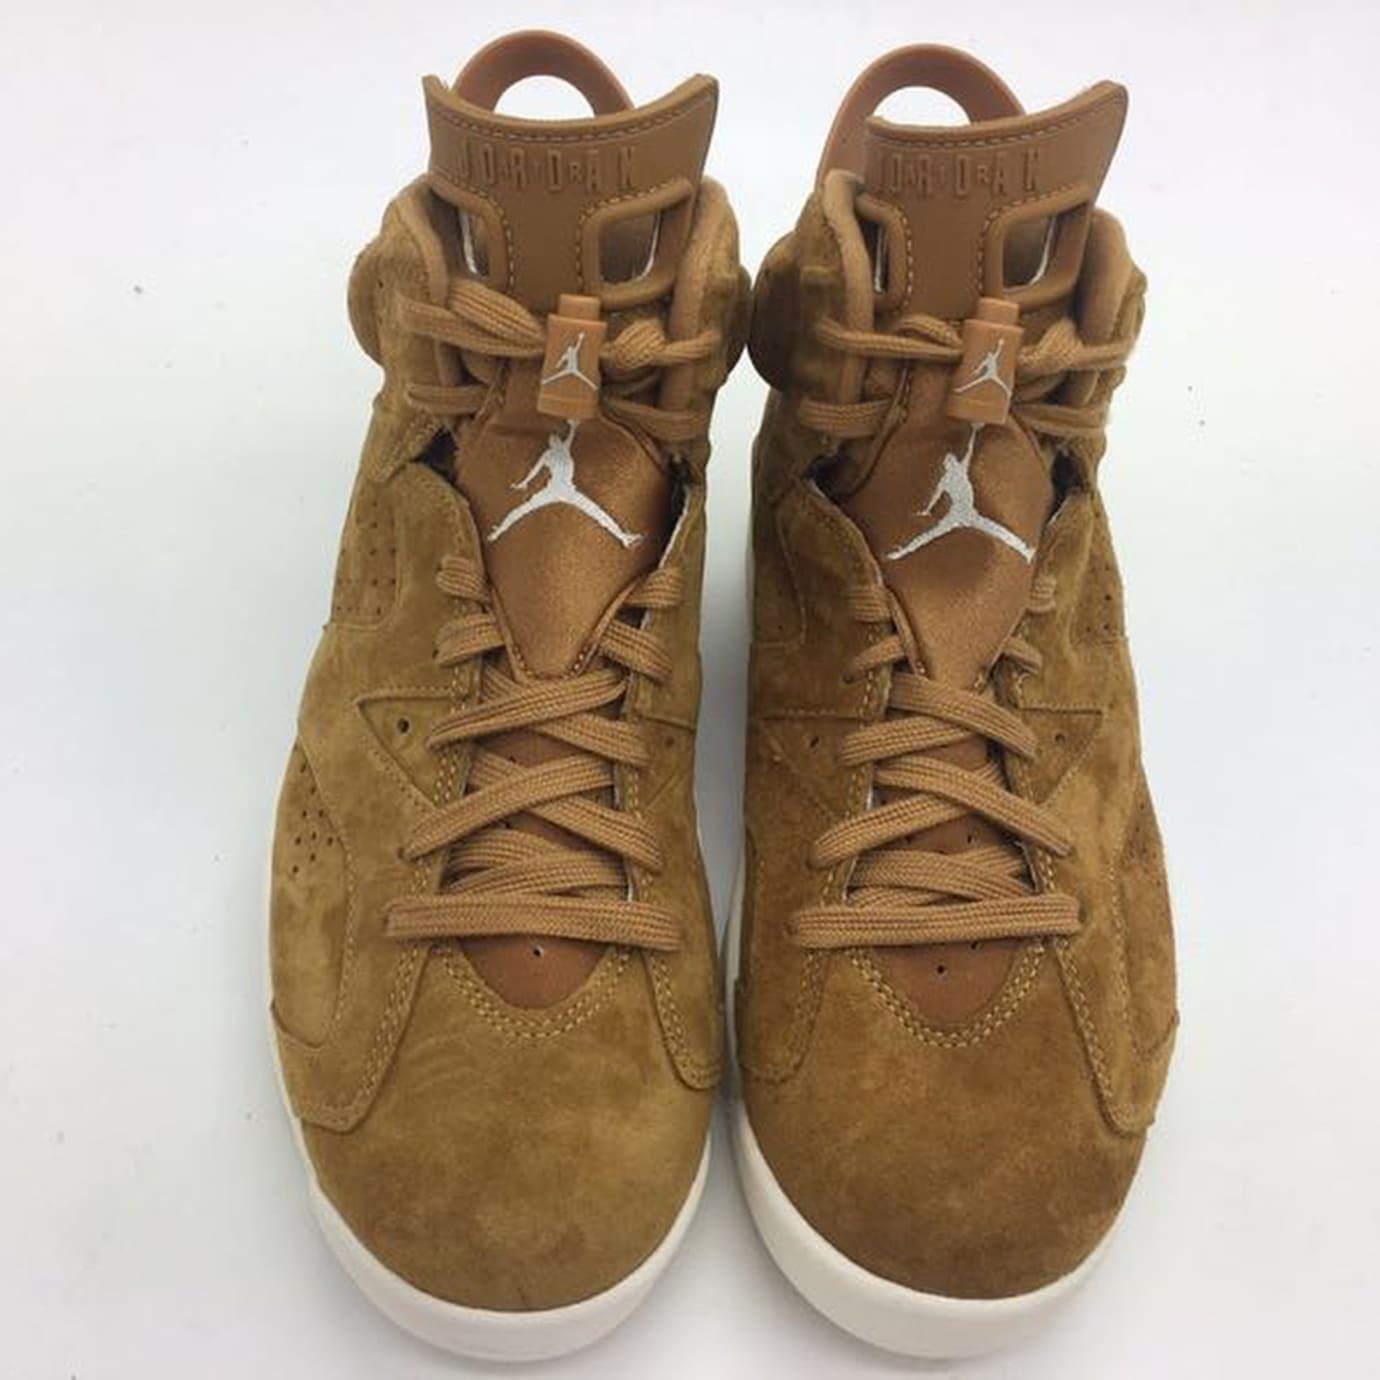 a3ca60a5900f15 Air Jordan 6 Golden Harvest Wheat Release Date 384664-705